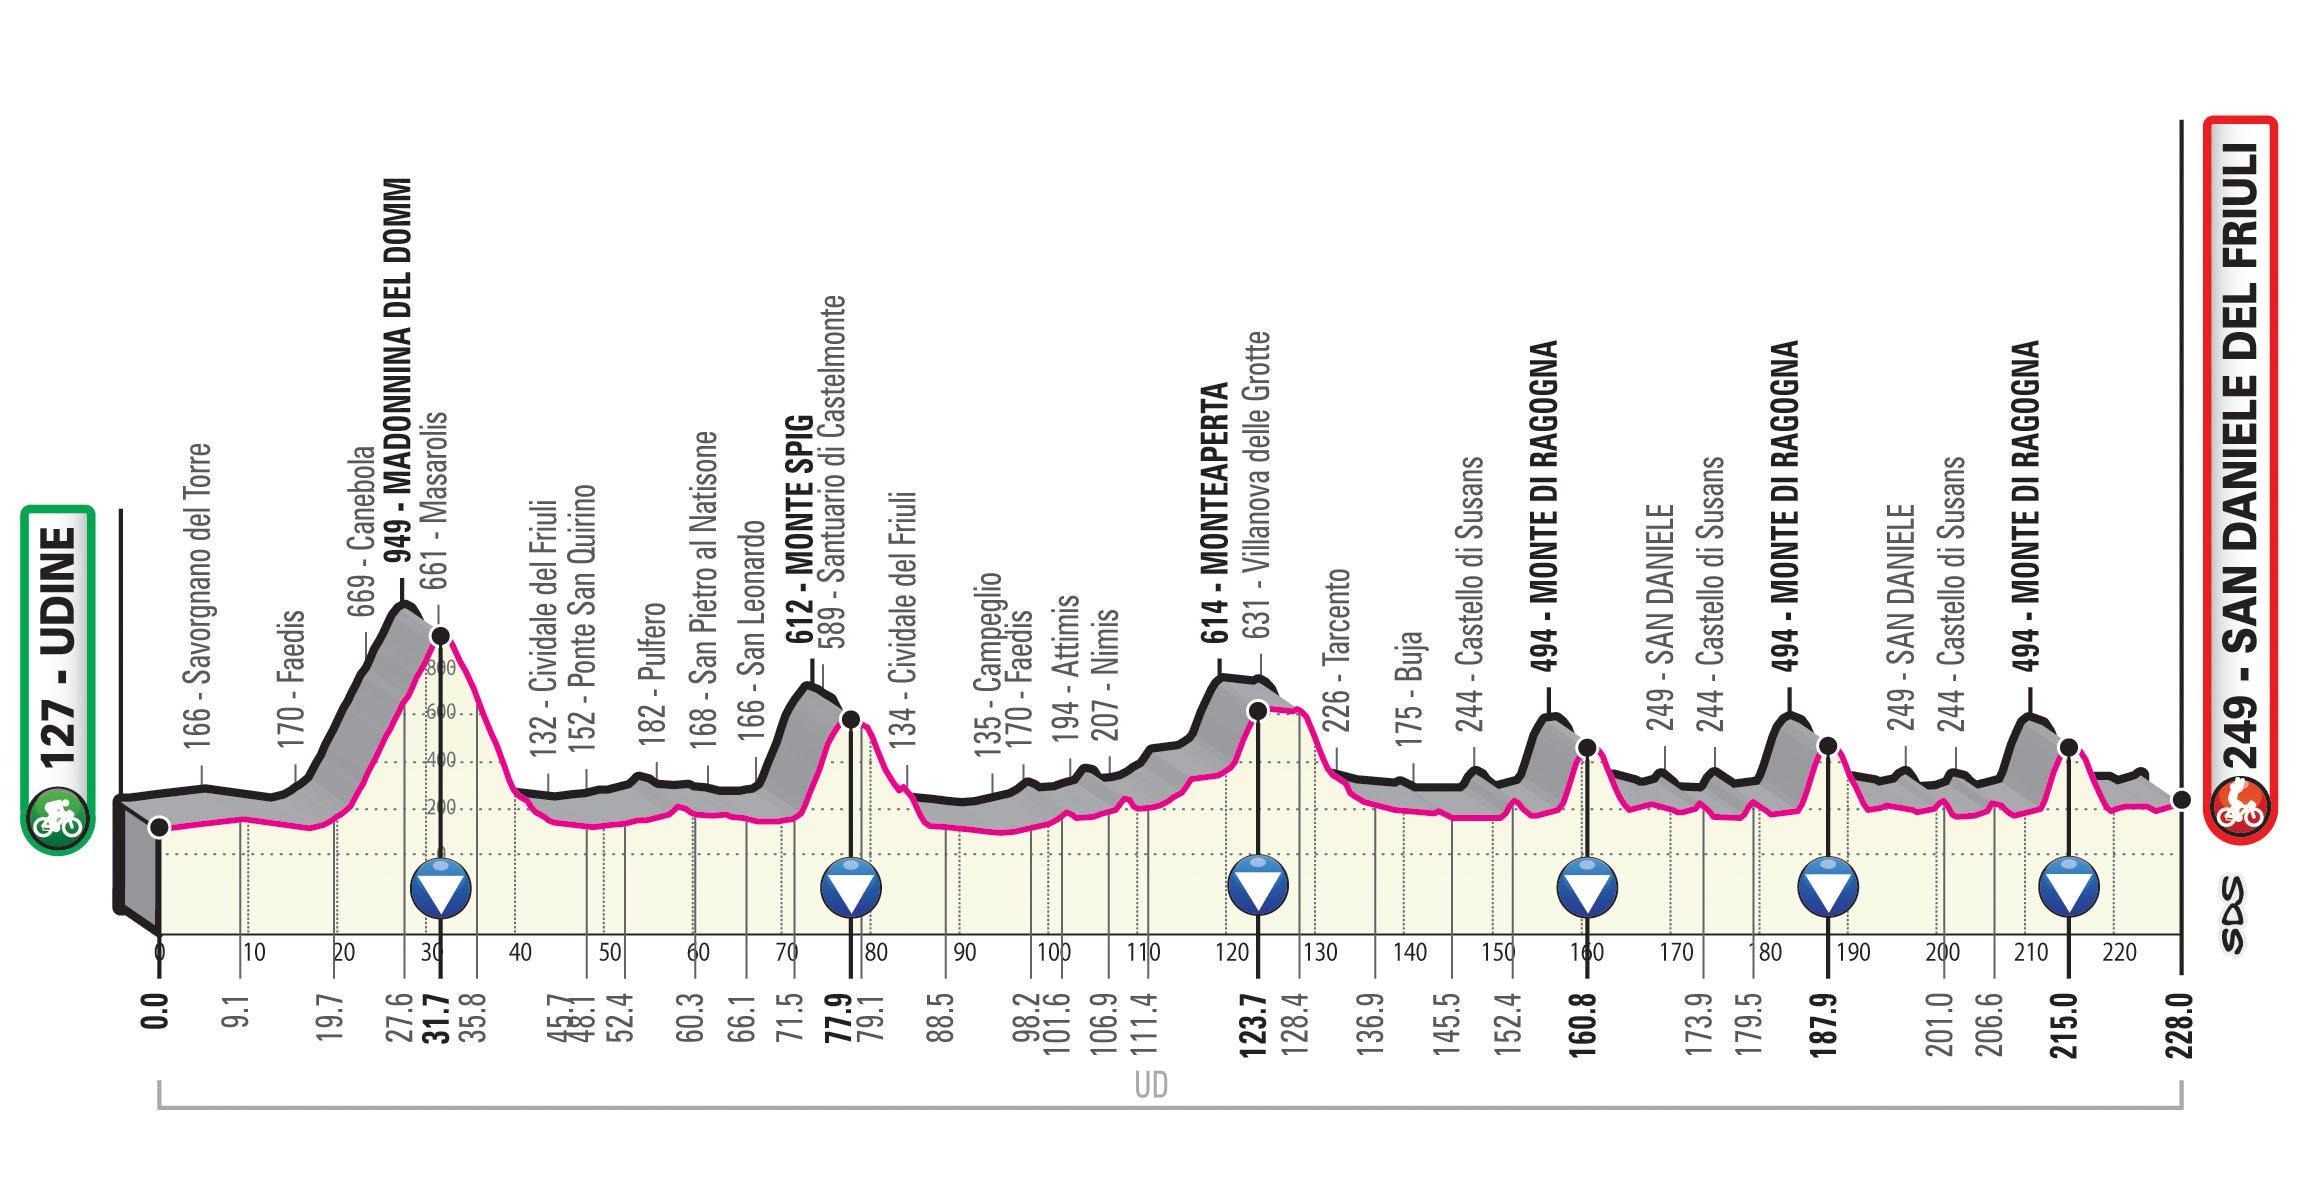 Udine – San Daniele del Friuli. 228 kilómetros